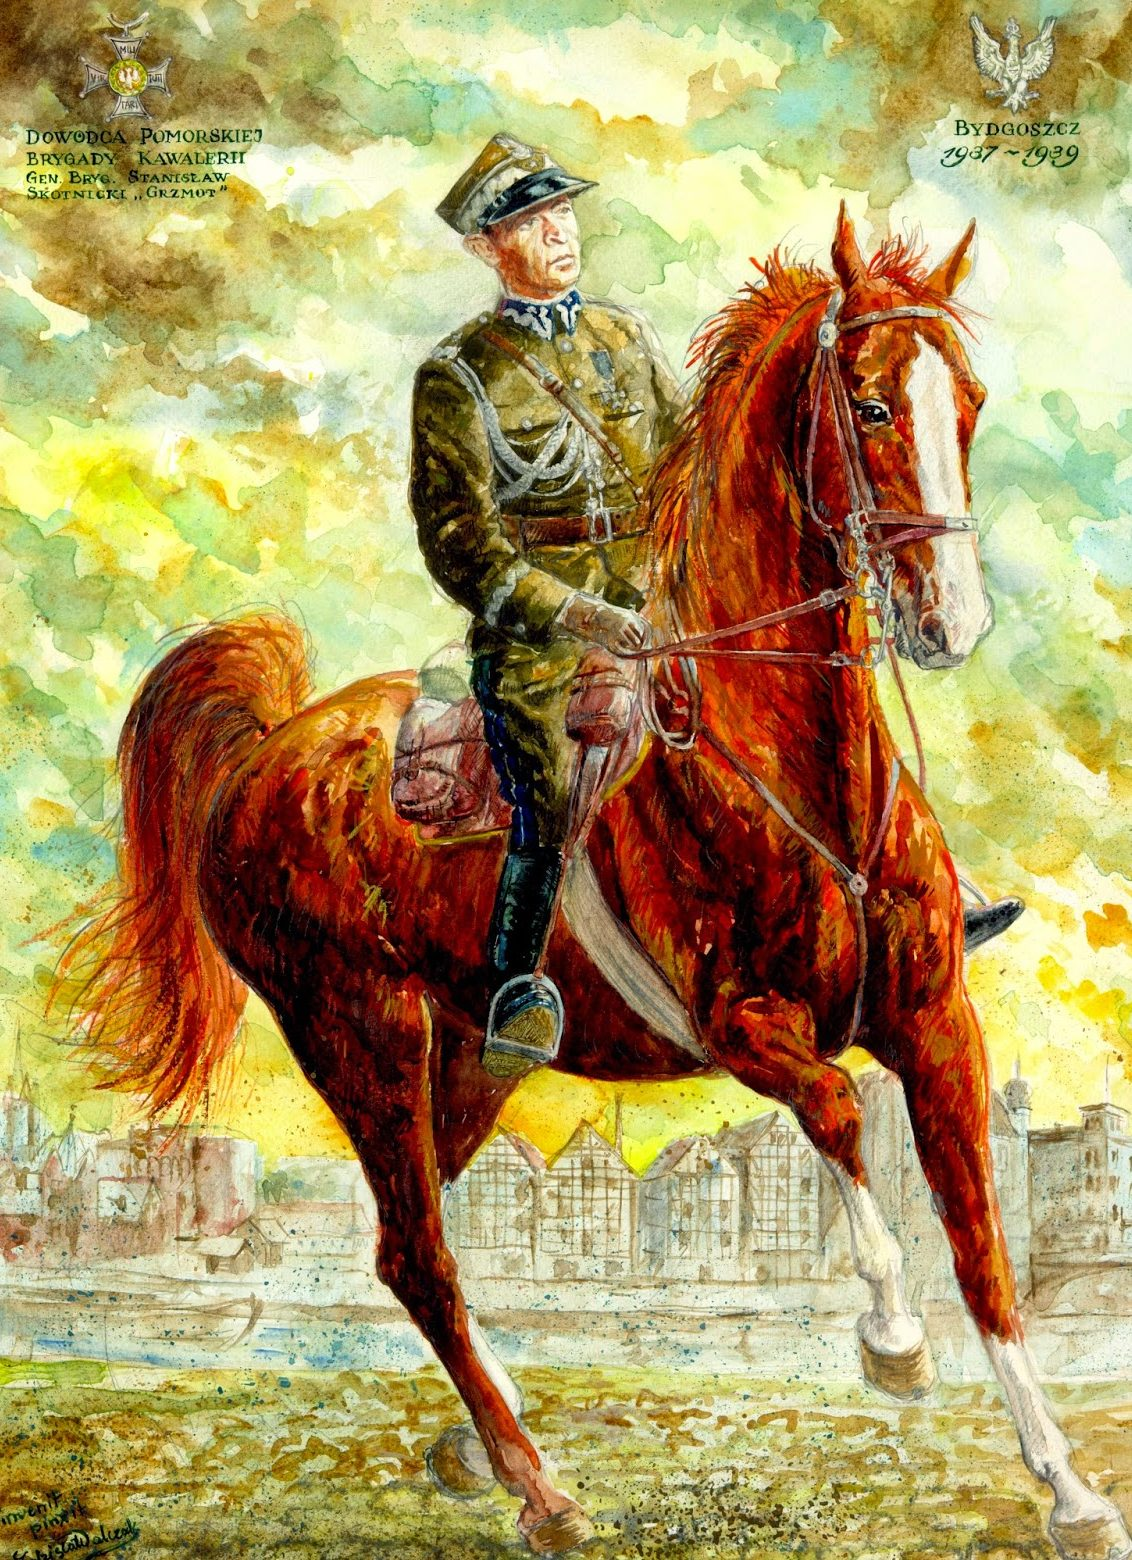 Walczak Zdzisław. Польские кавалеристы.